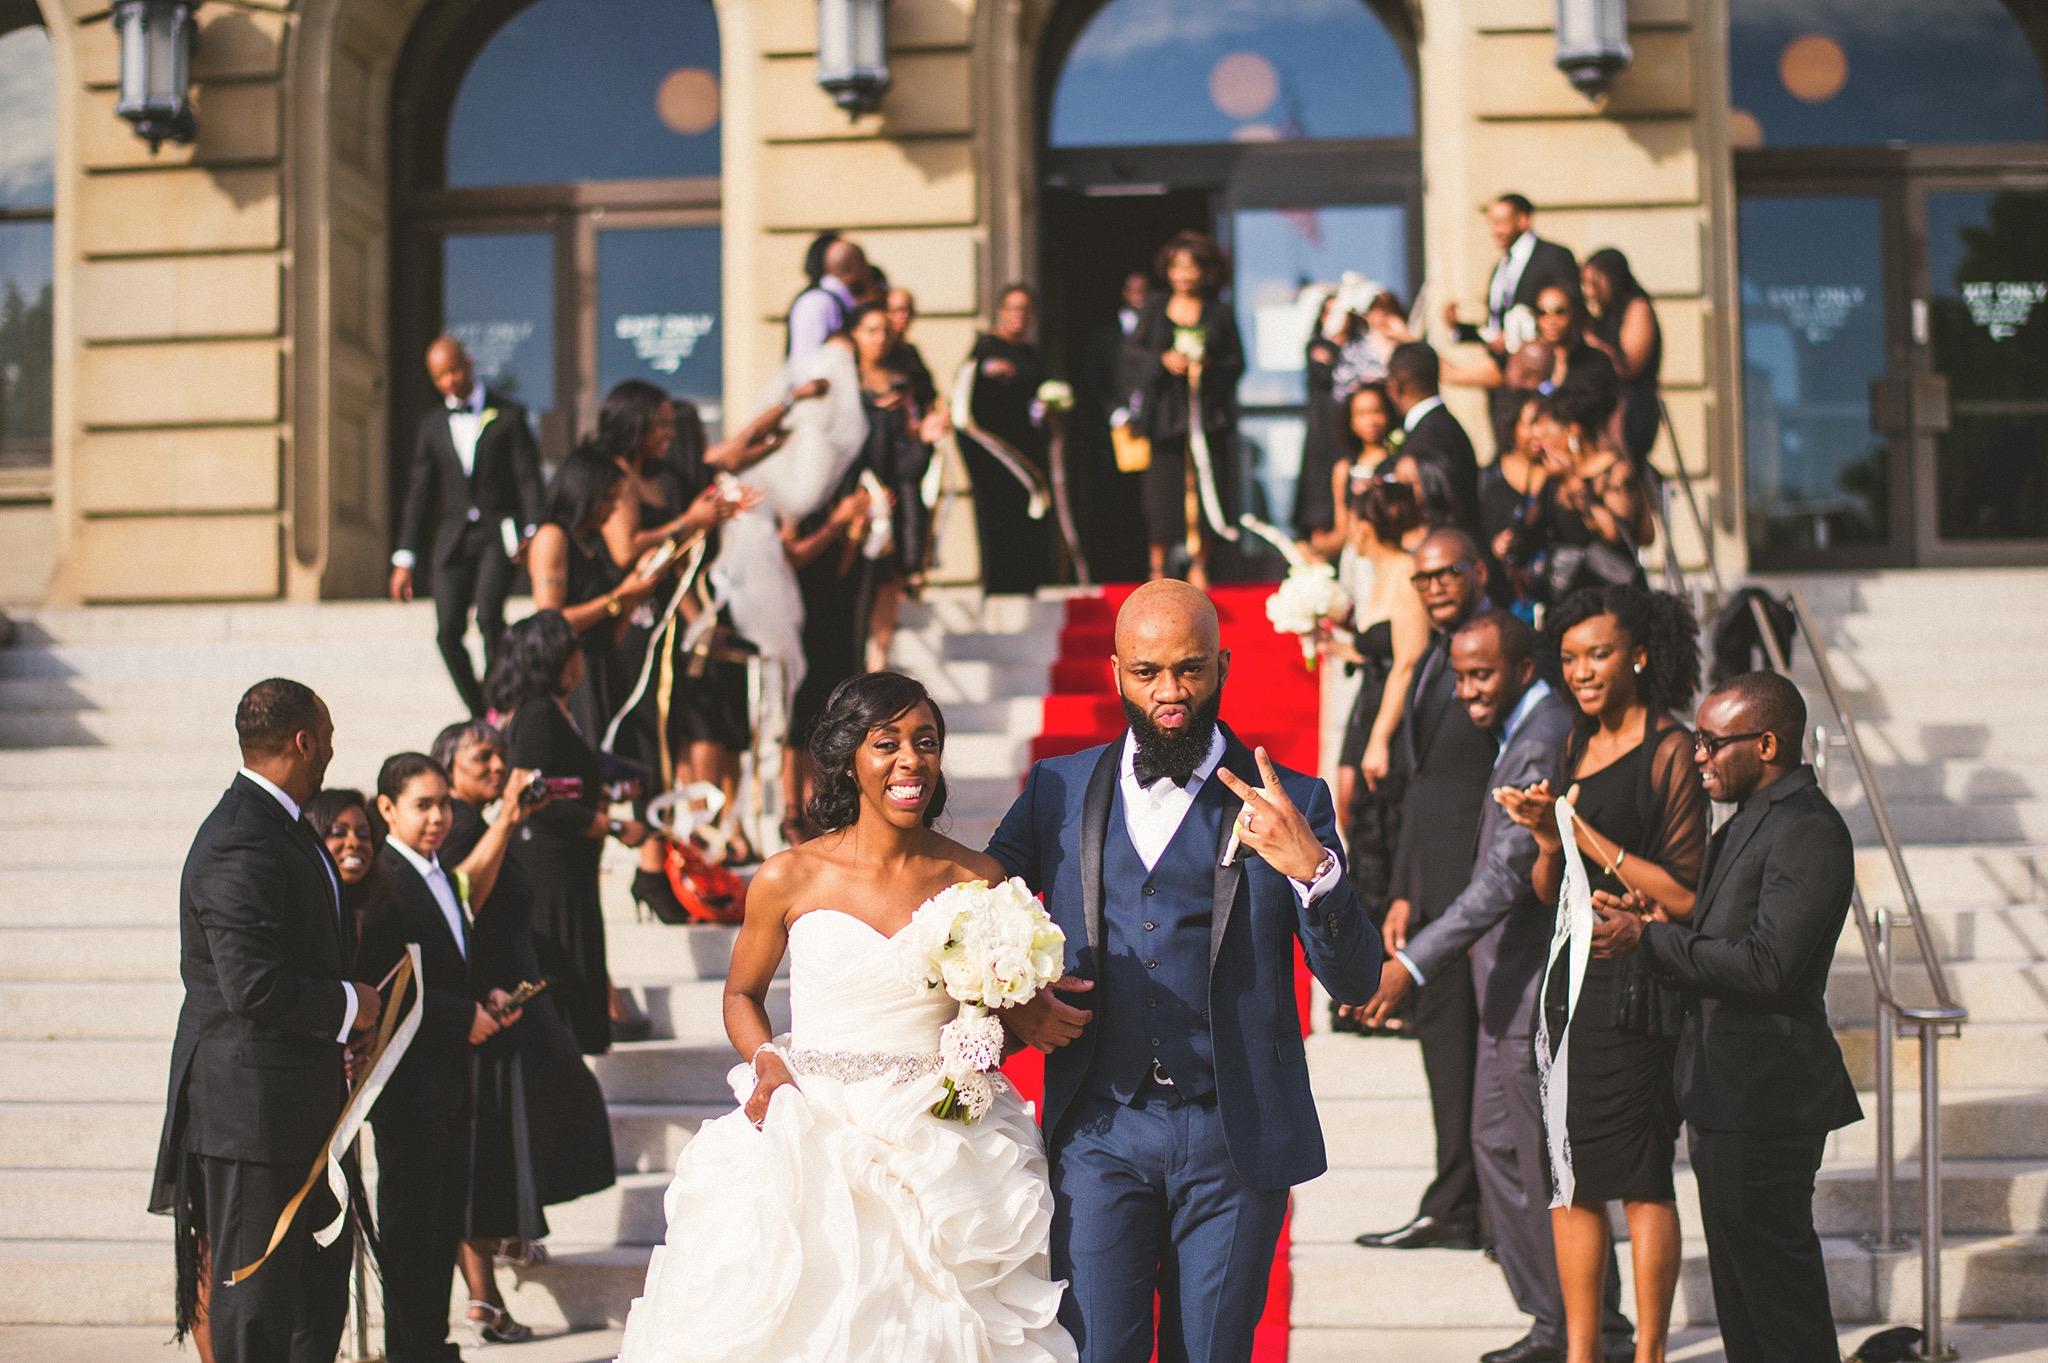 58-wedding-photographer-in-pa.jpg